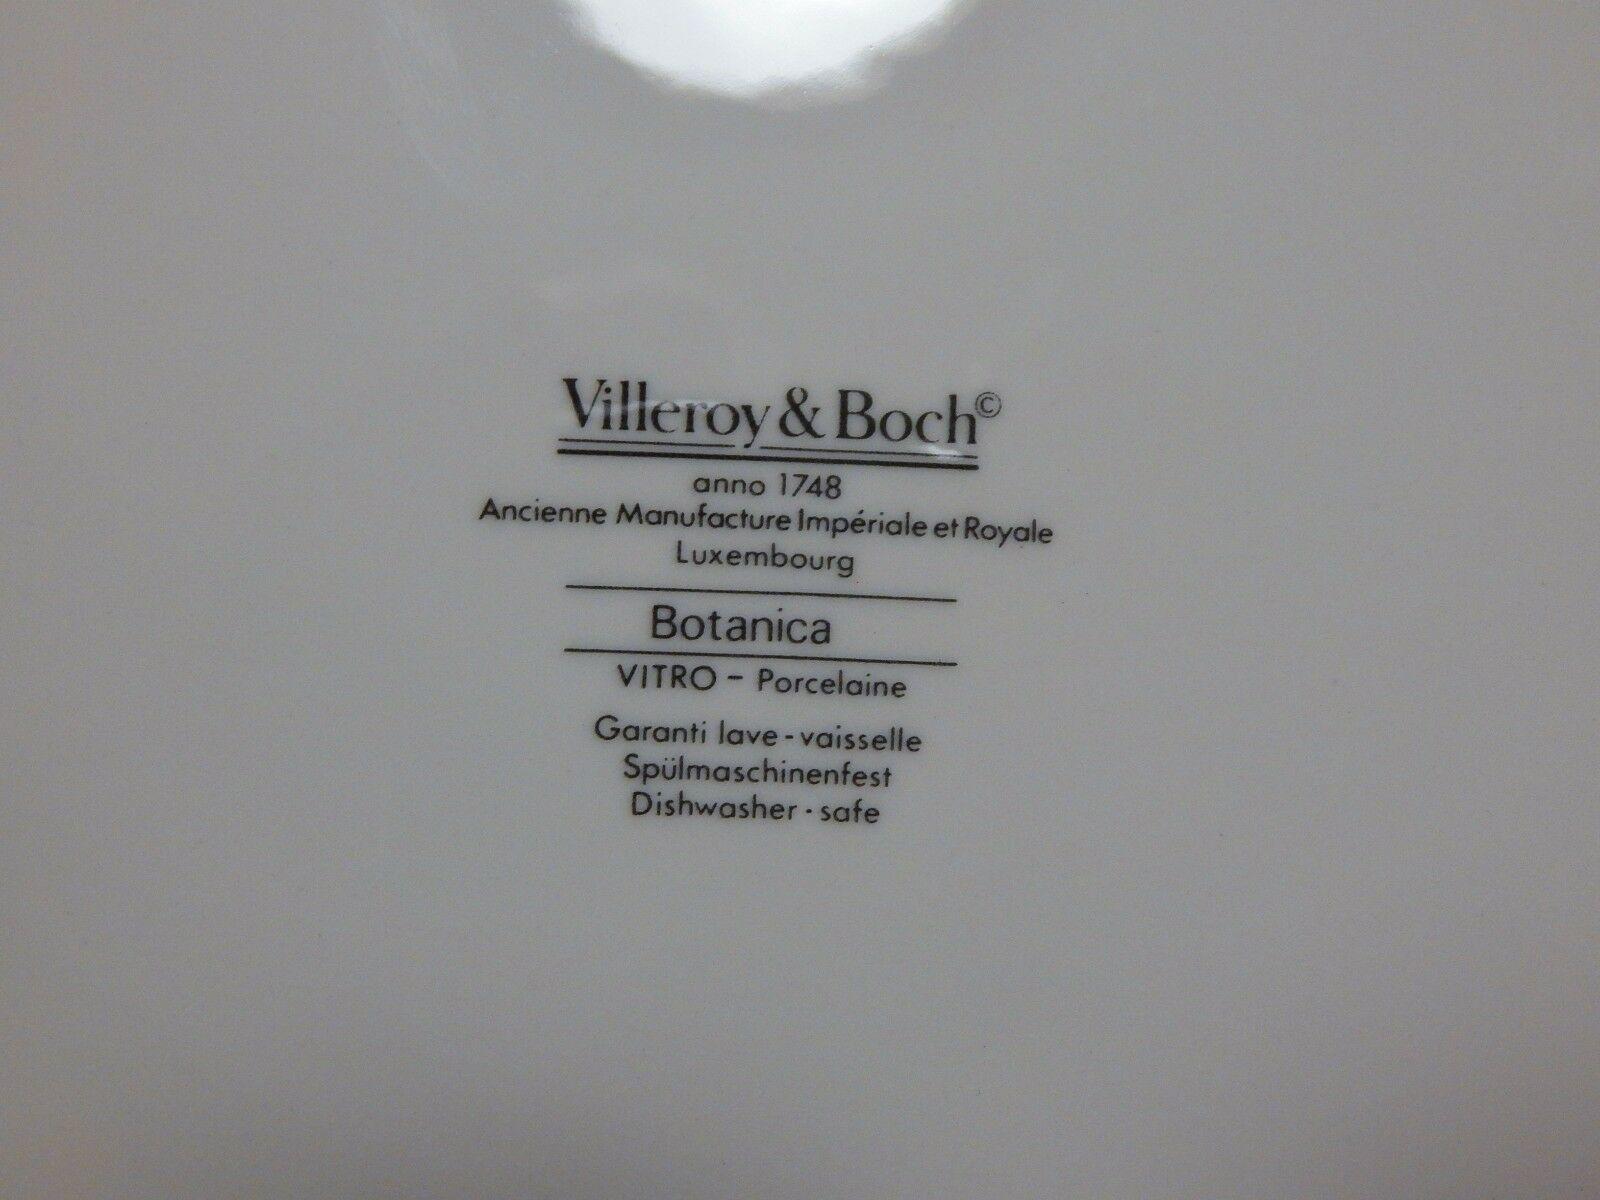 "Villeroy & Boch Botanica Chop Plate 12 1/4"" Nicotiana"